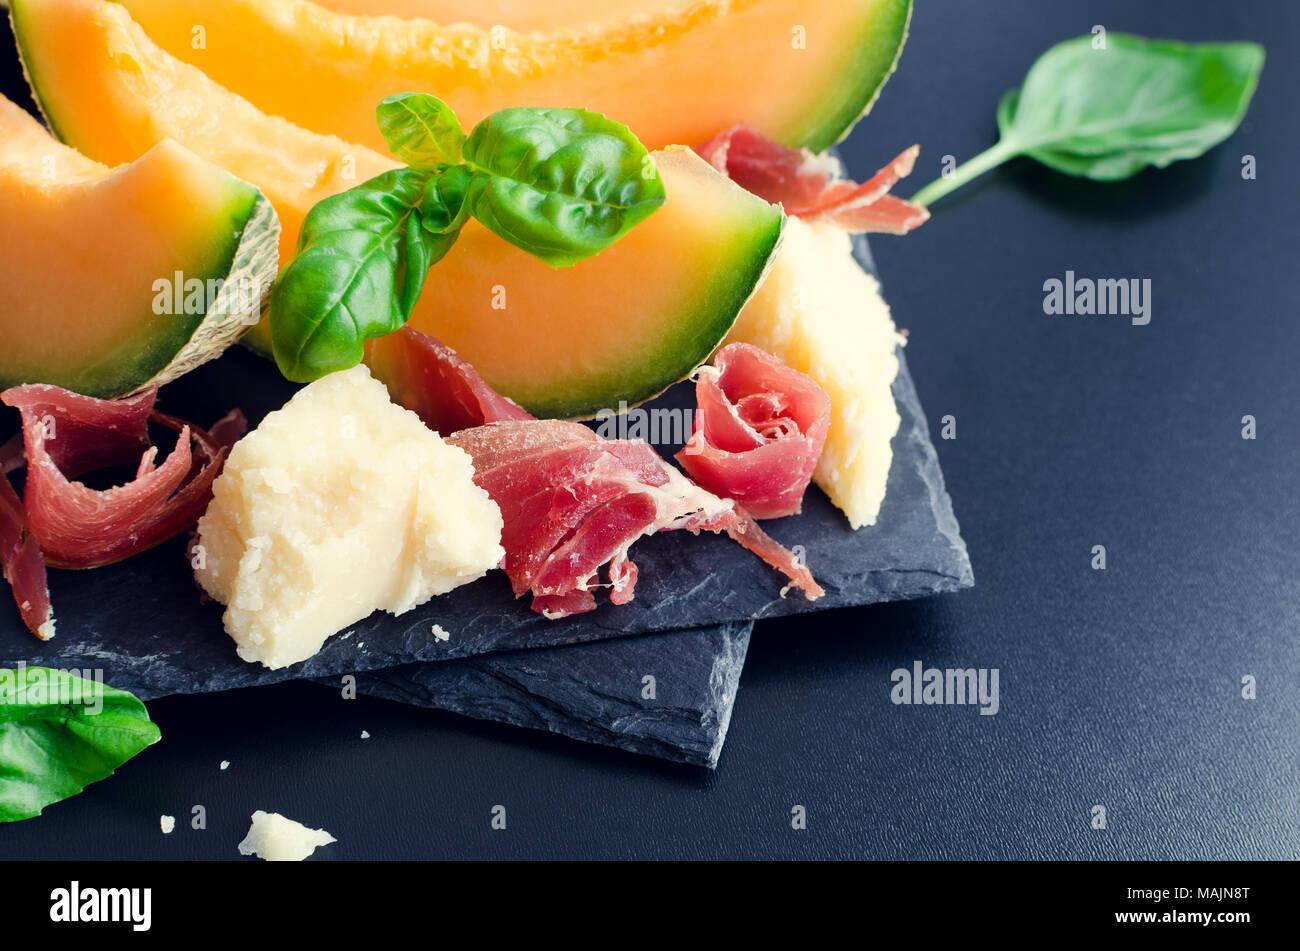 Concepto de comida italiana con melón y jamón sobre fondo oscuro. Aperitivo tradicional antipasto. El enfoque selectivo. Imagen De Stock